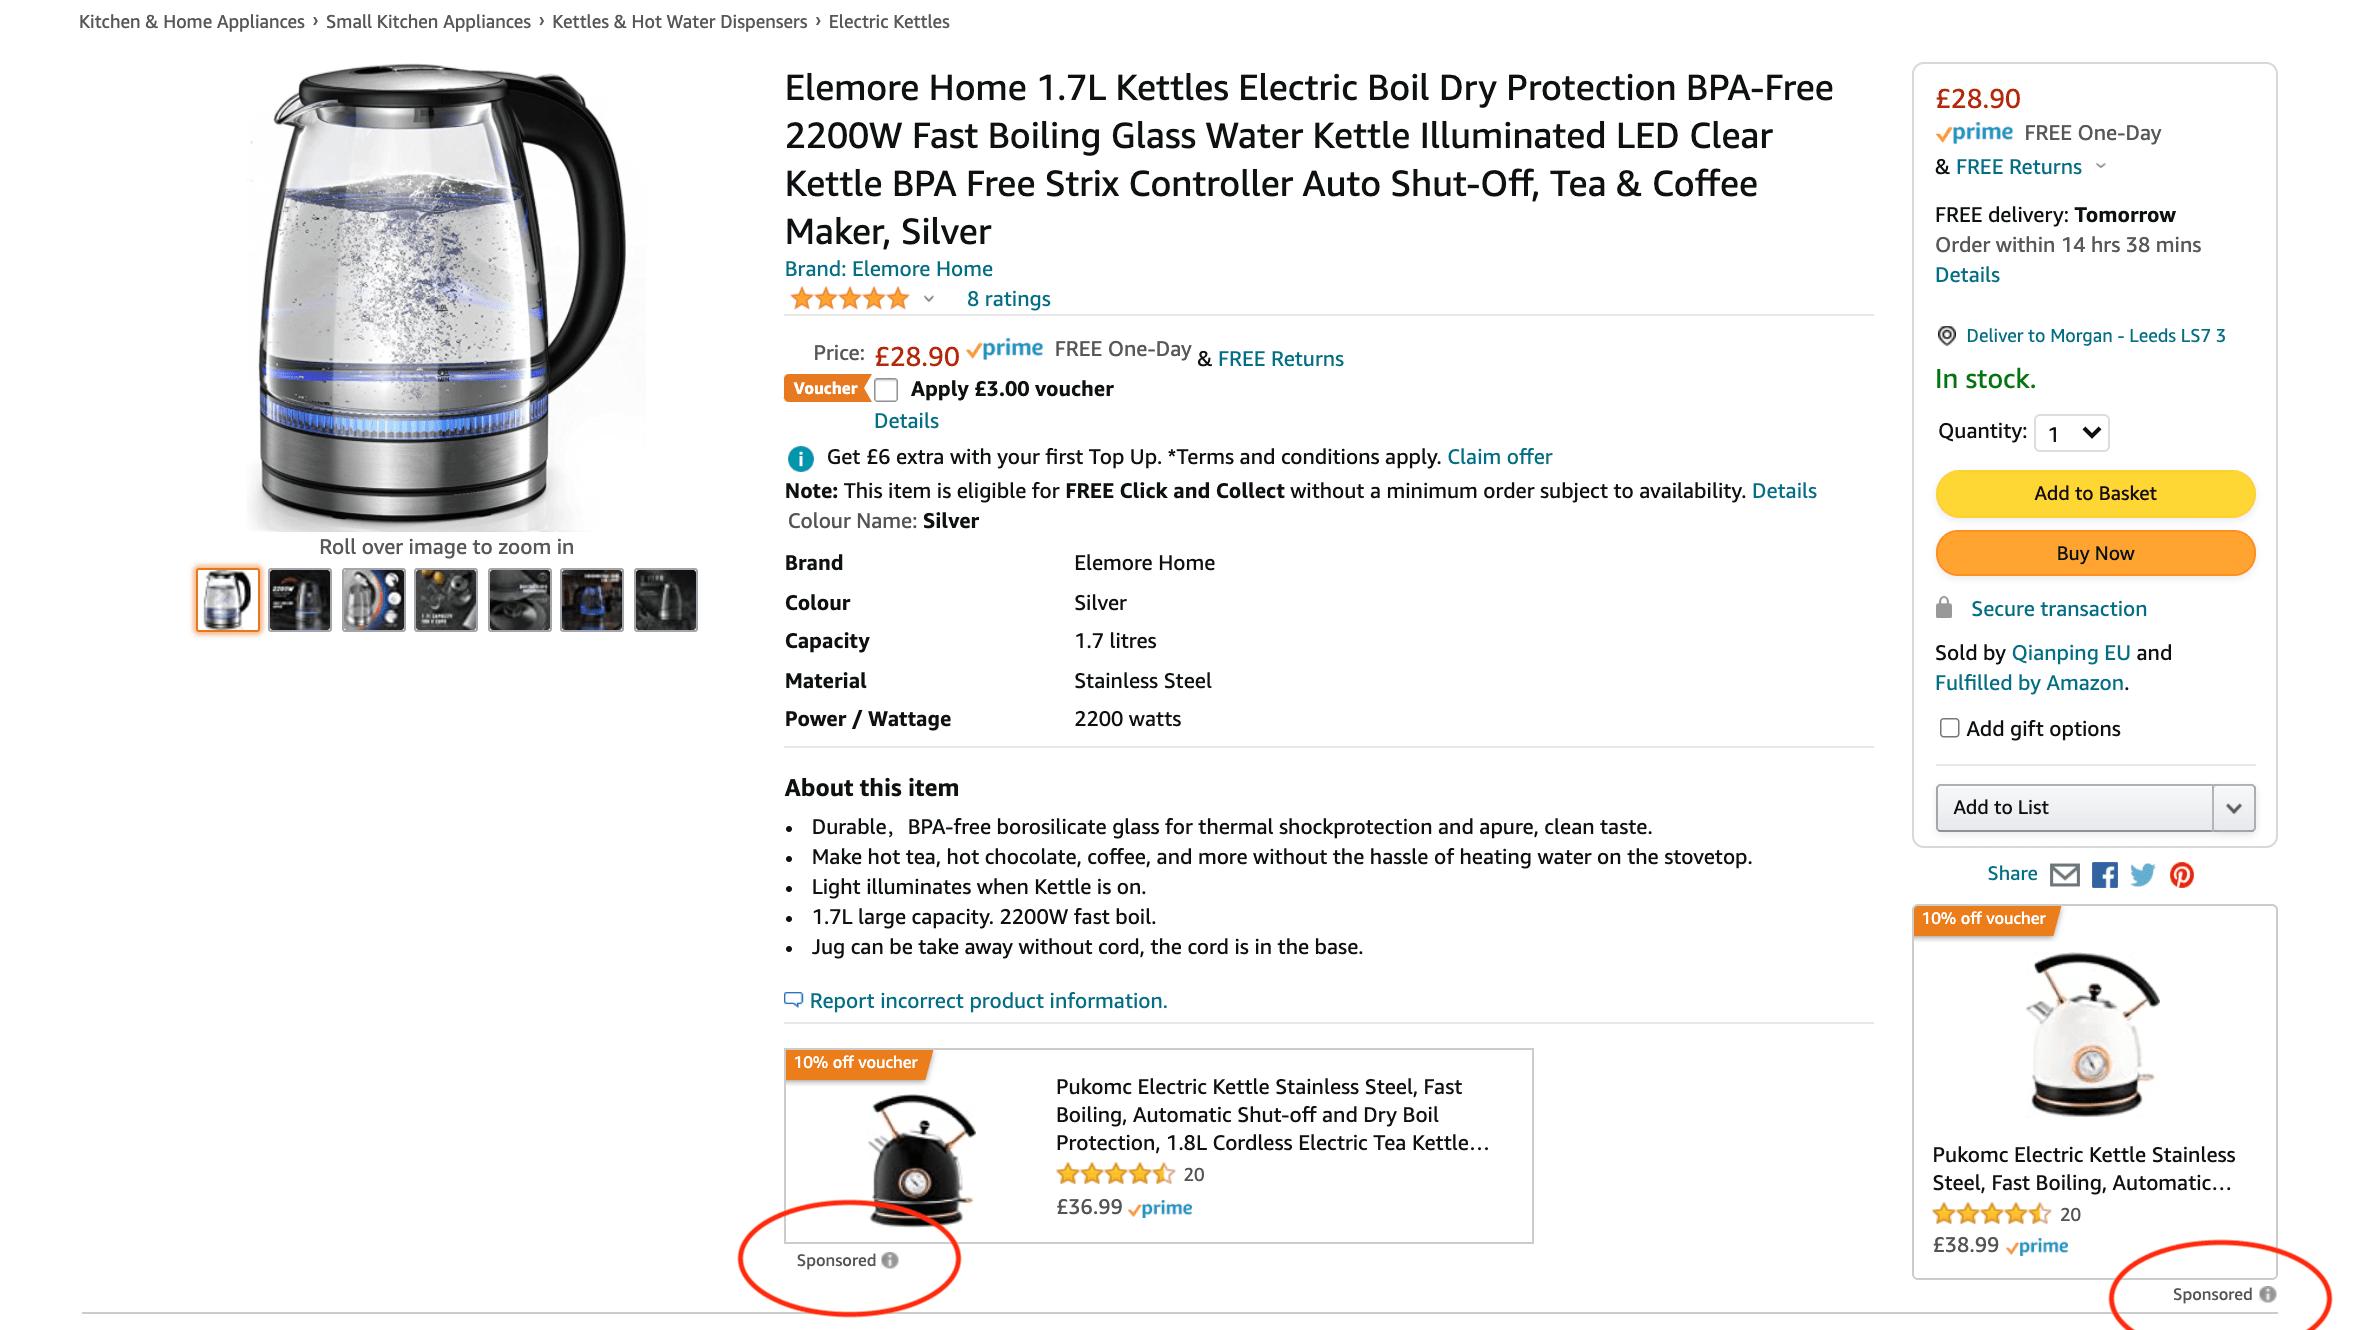 Amazon PPC display ads